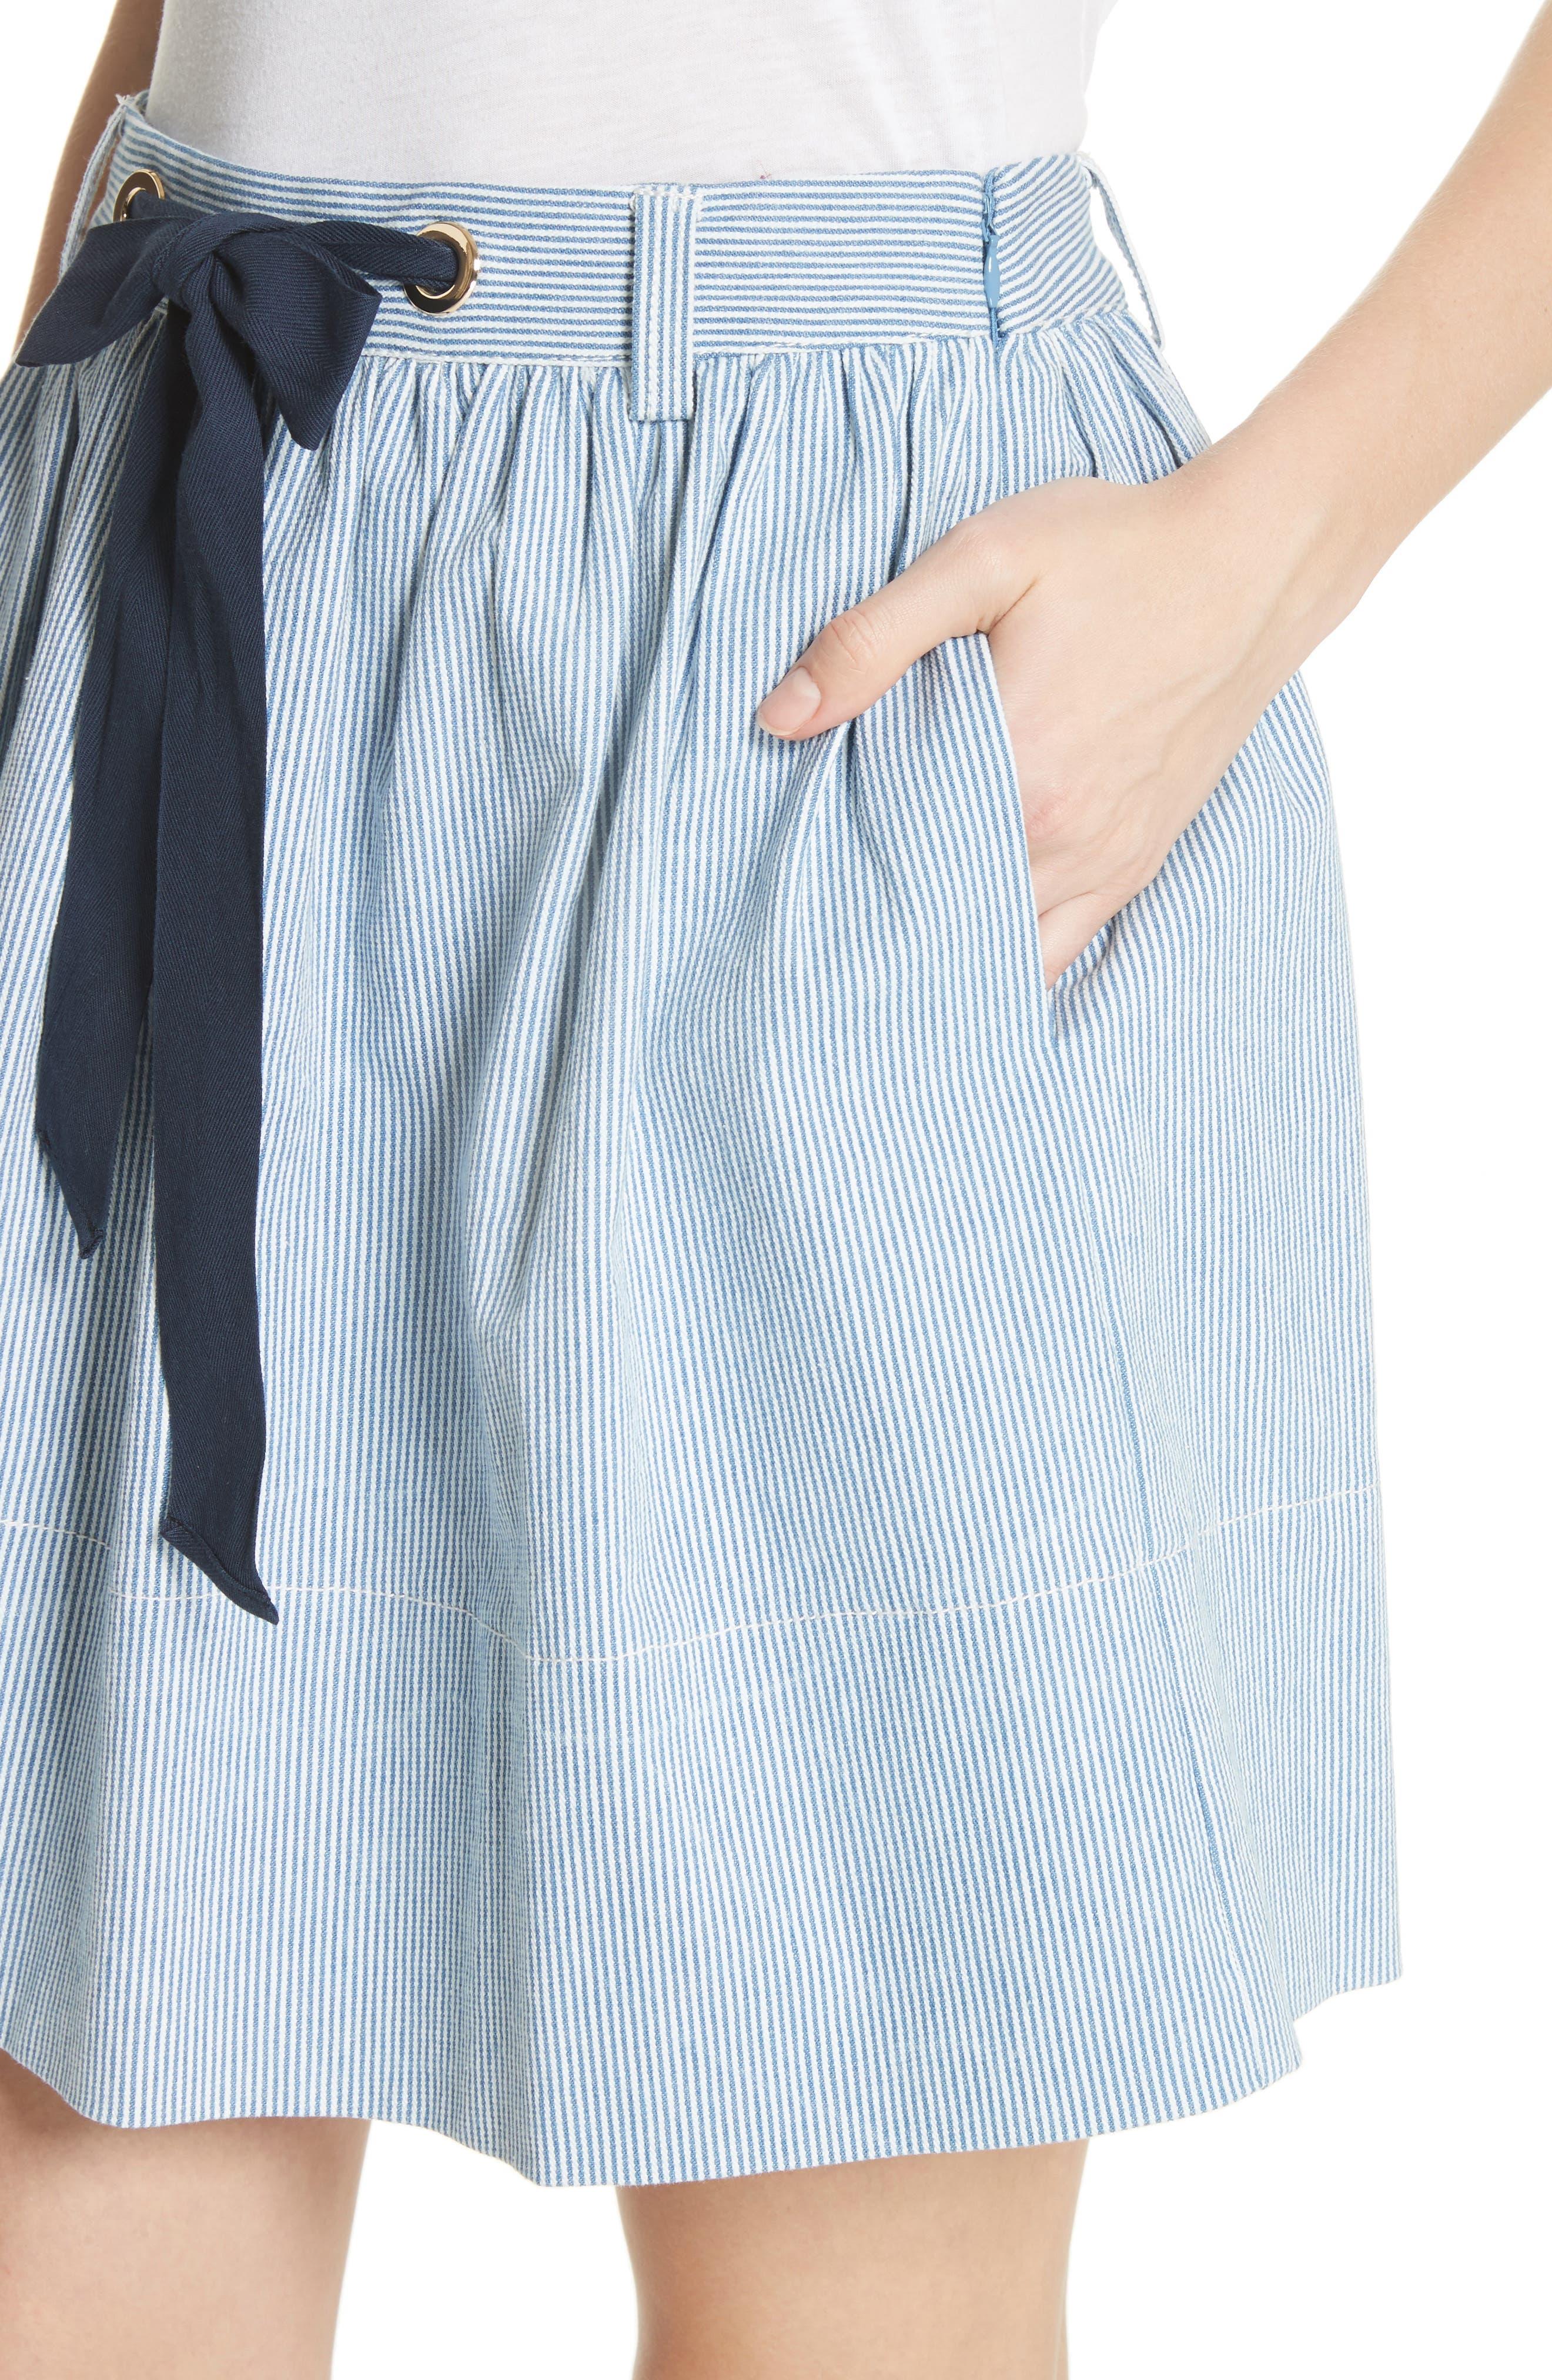 railroad stripe denim skirt,                             Alternate thumbnail 4, color,                             Indigo/ Cream